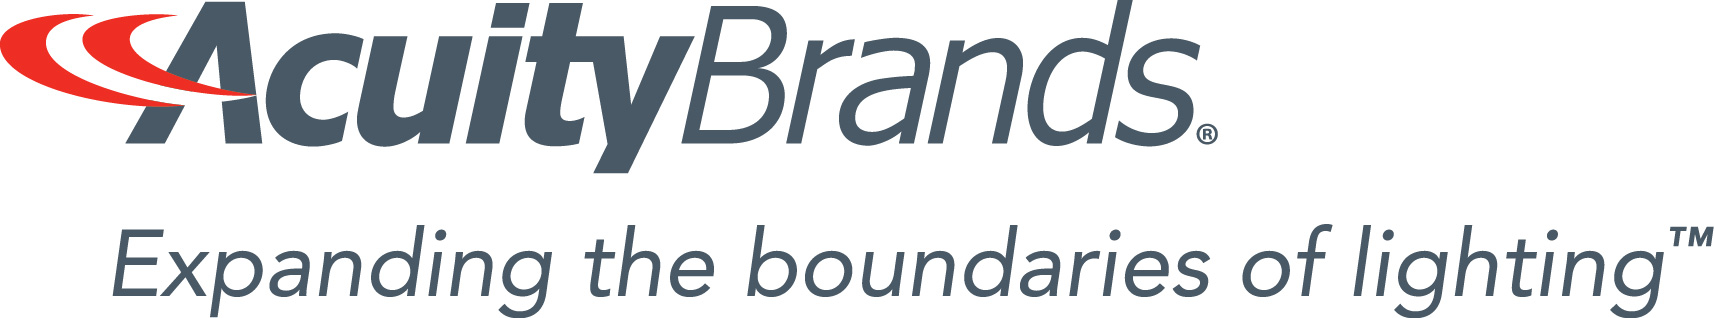 Brand Logo Downloads Acuity Brands